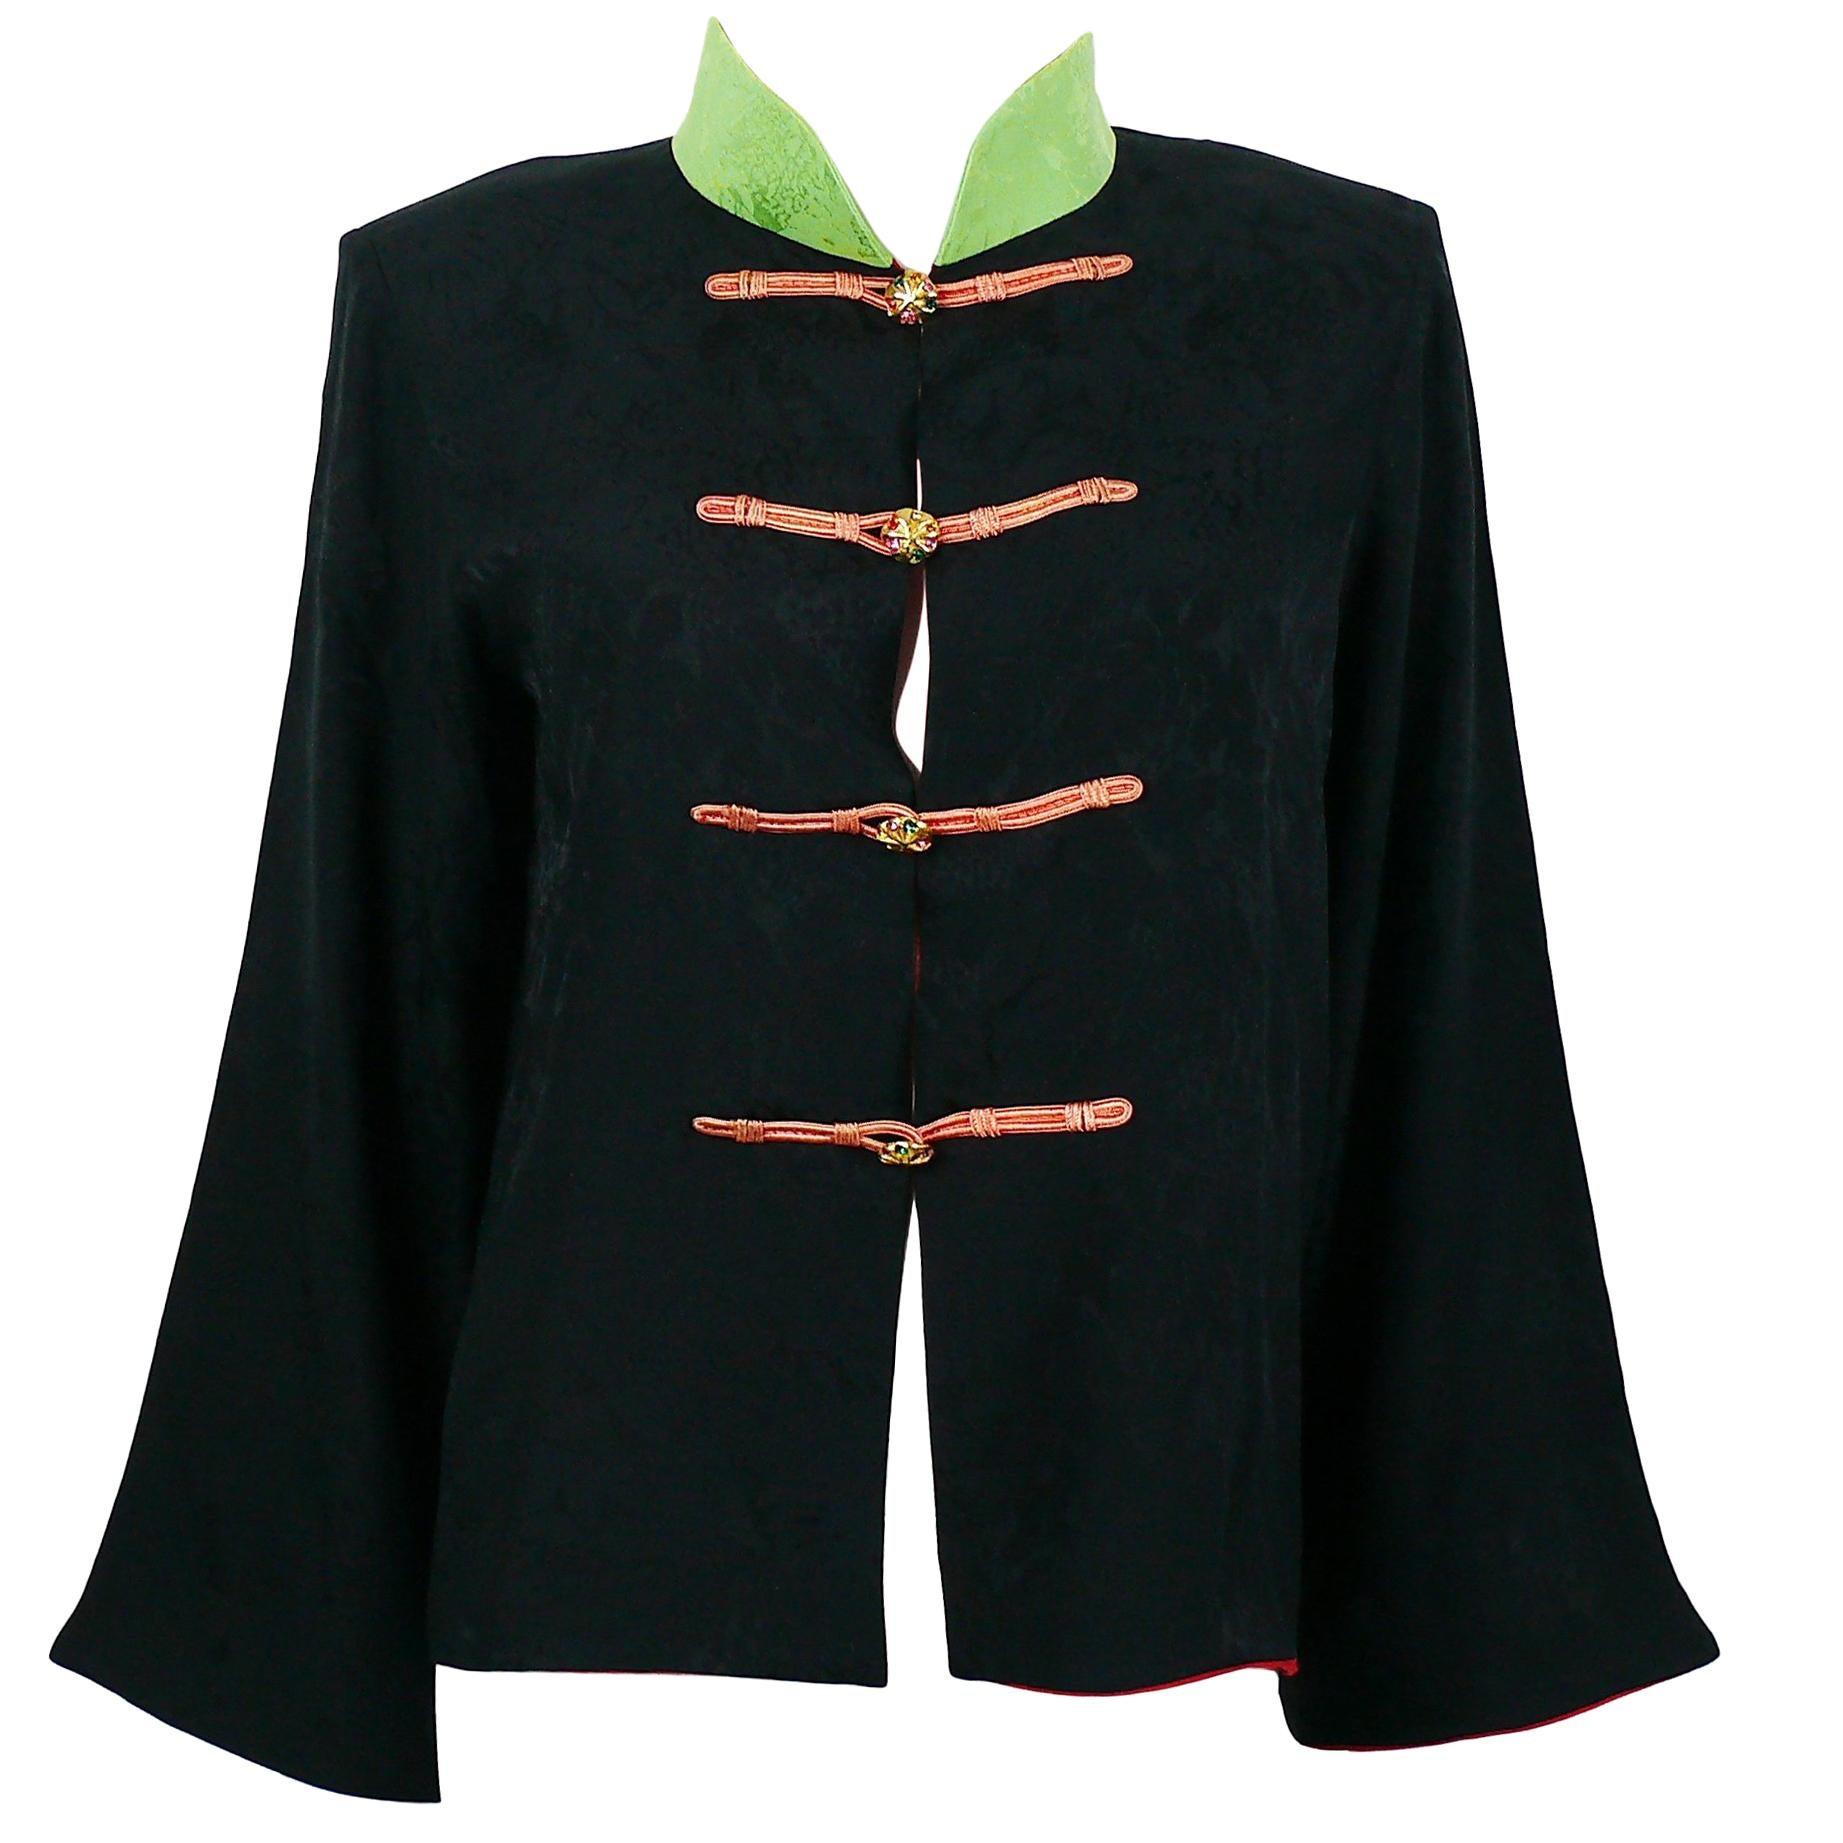 Yves Saint Laurent YSL Vintage Chinese Oriental Inspired Shirt Jacket